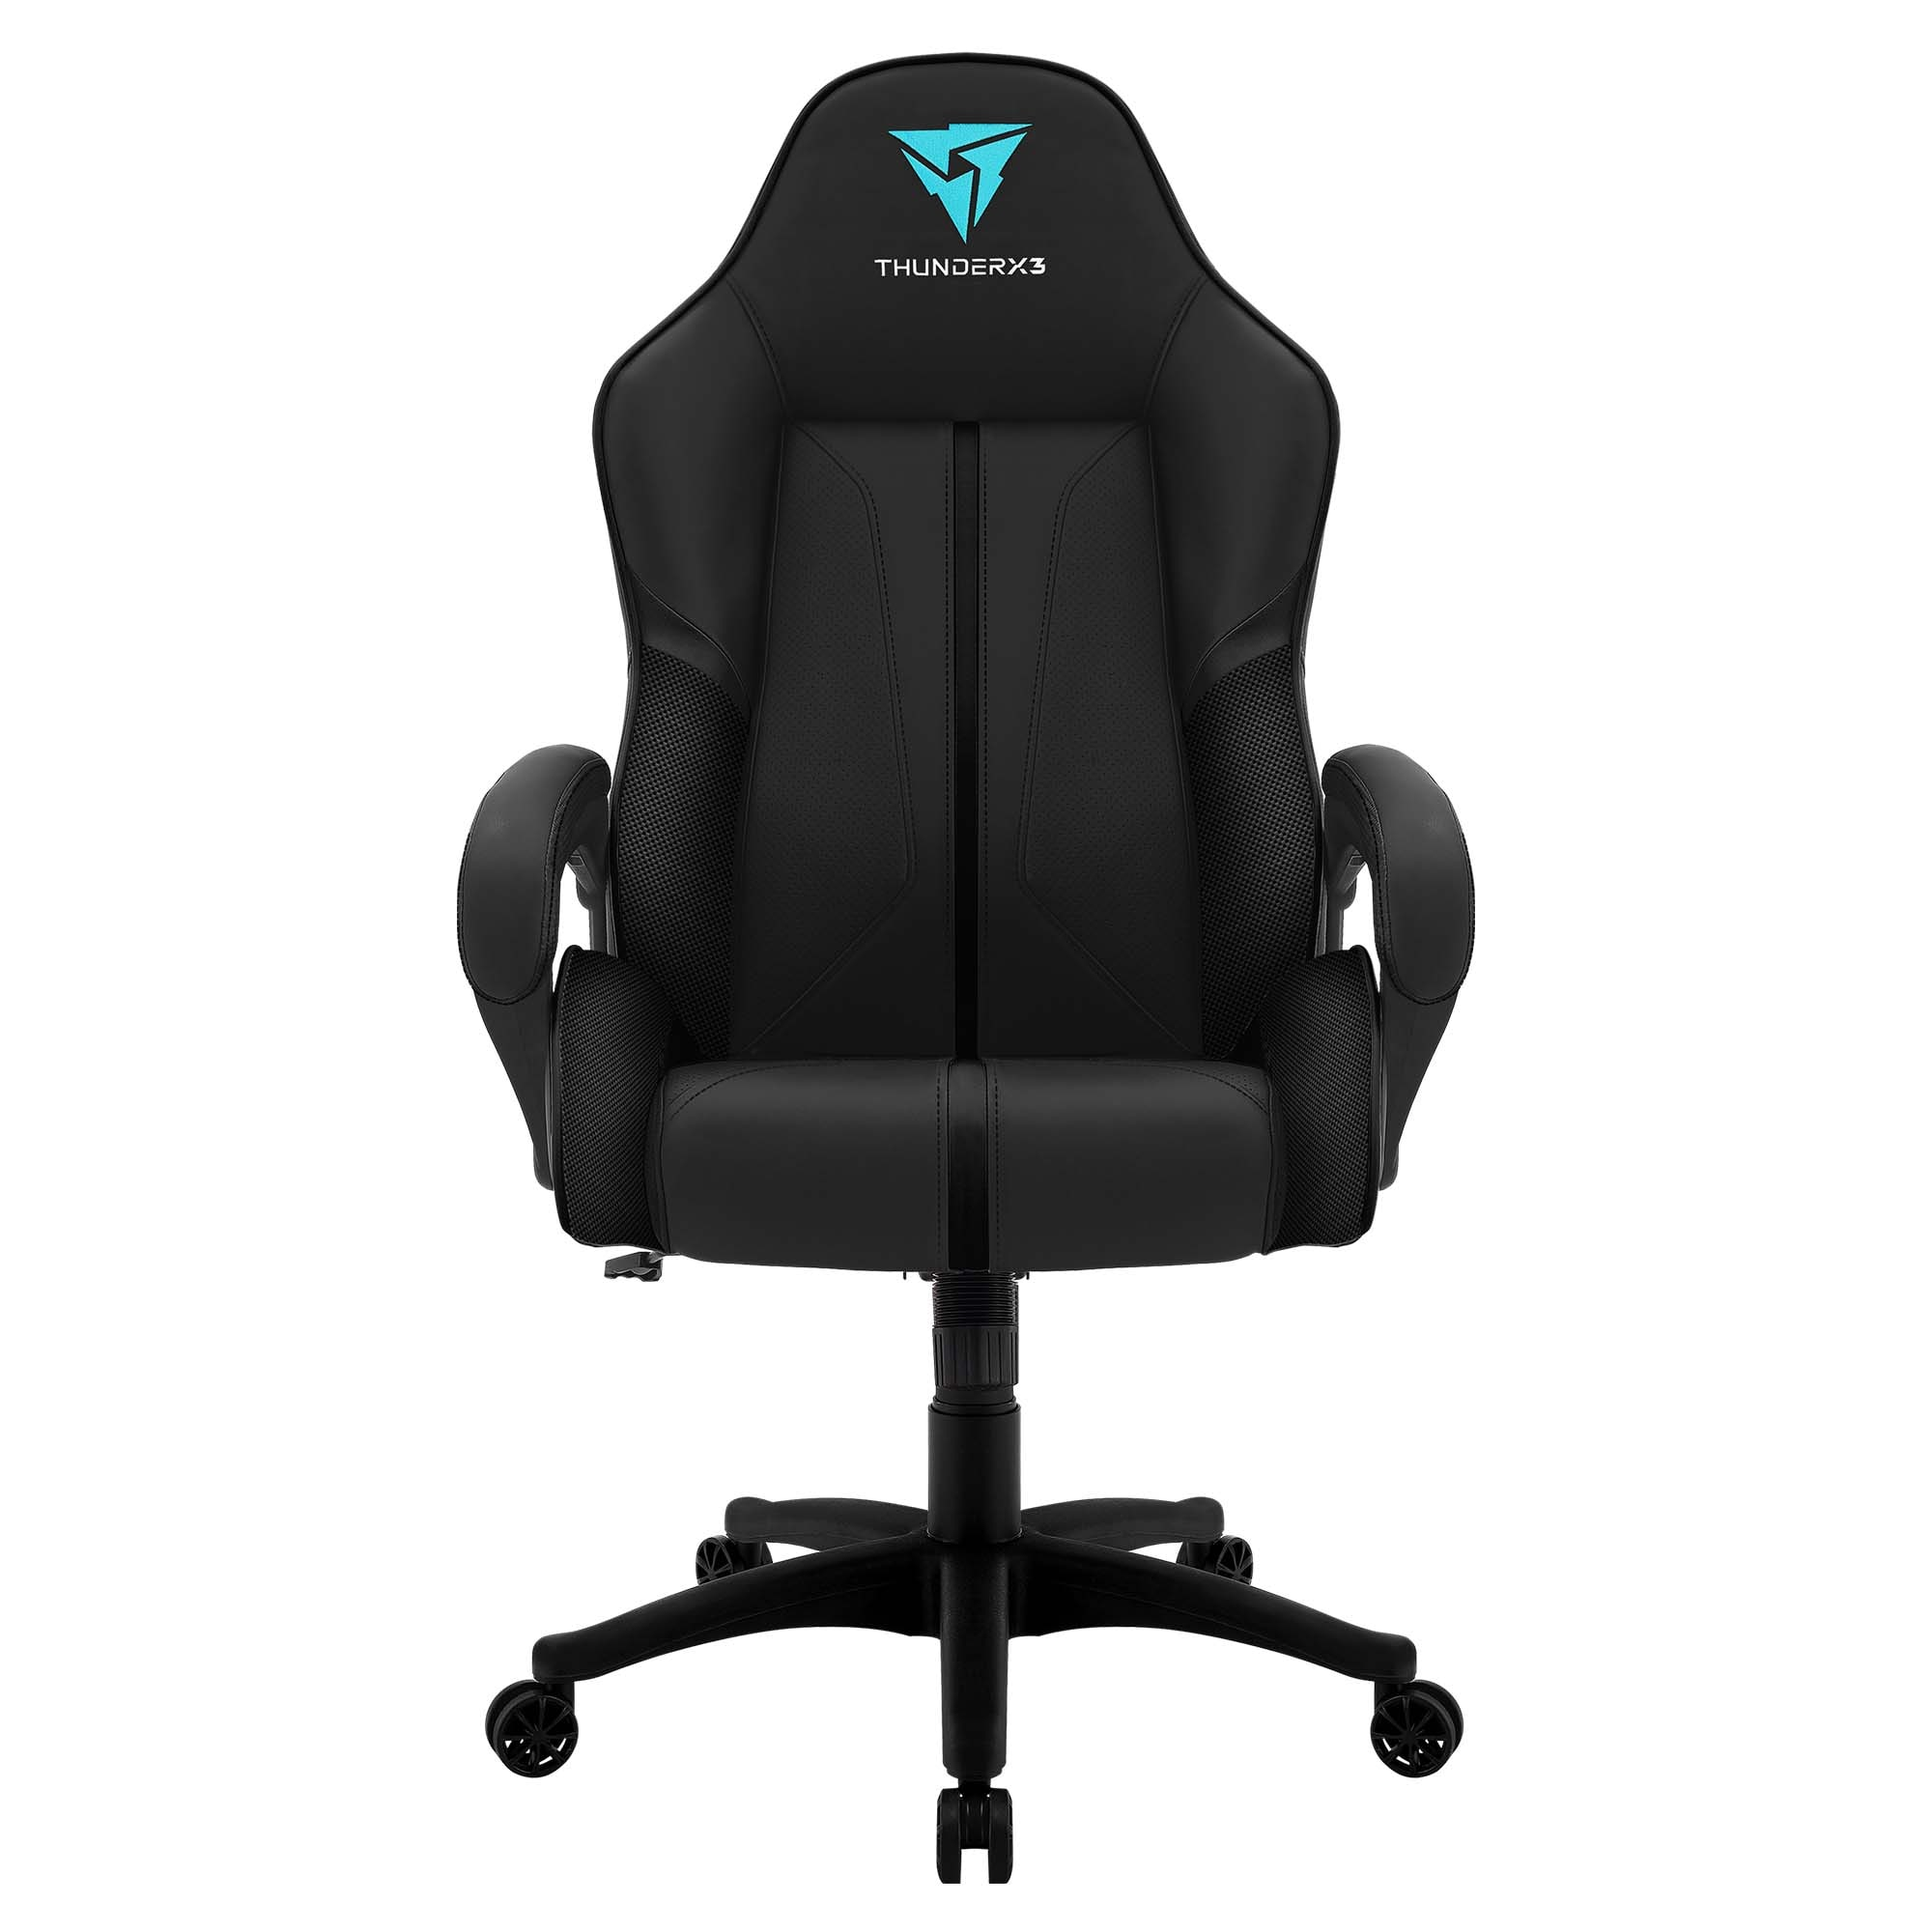 ThunderX3 BC1 - Black gaming chair - 1